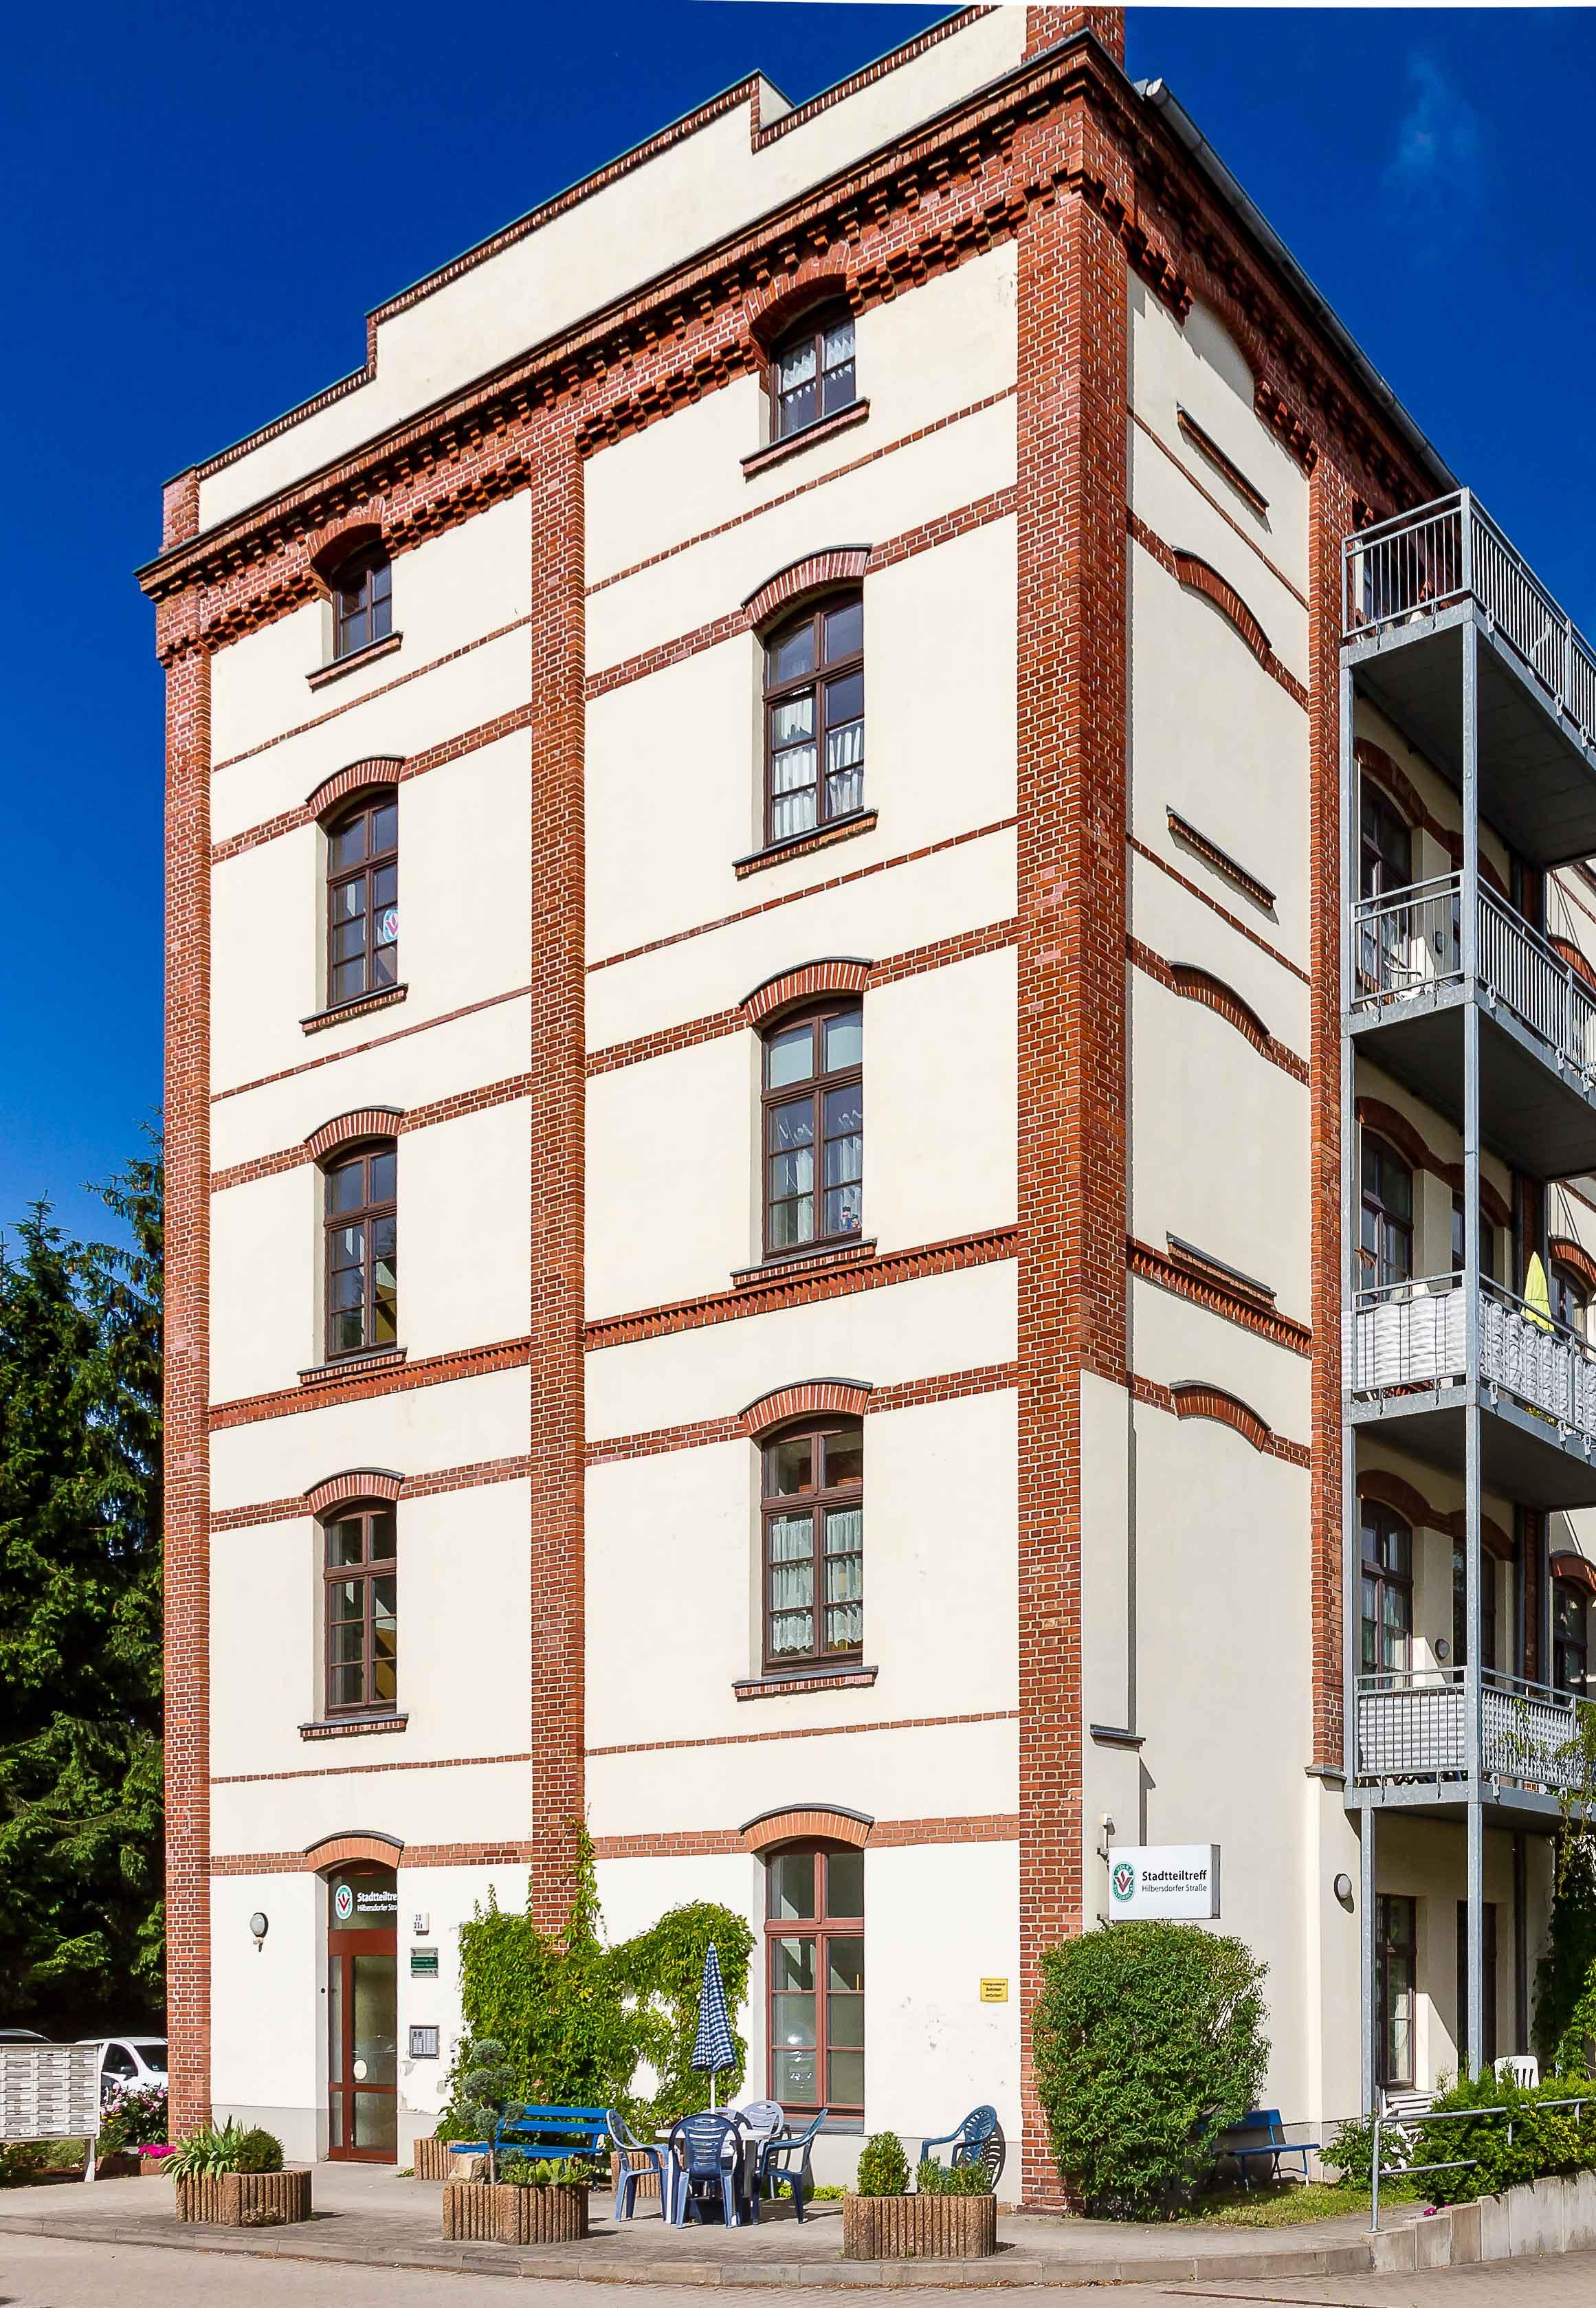 Wohnung Chemnitz Hilbersdorf